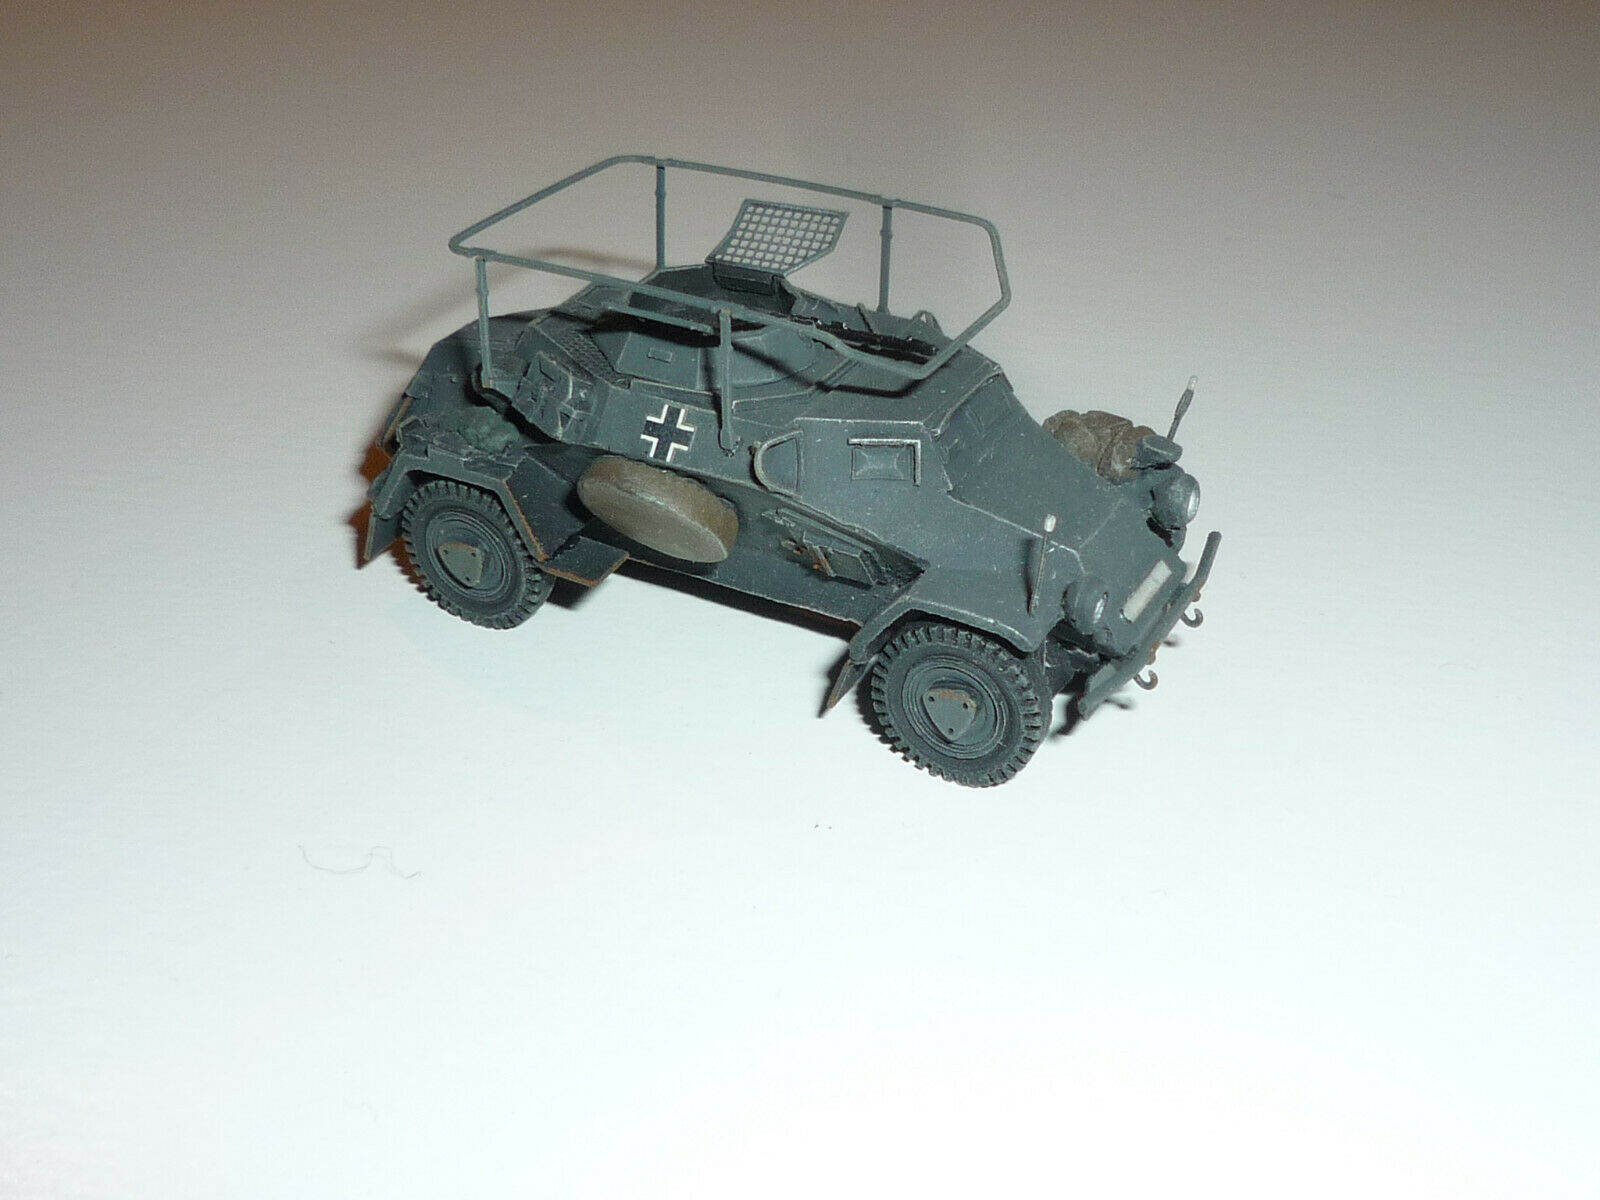 Artitec 1 87 - 387.106-GR SD. Kfz 223, 4-rad, radio Car, MG34, Grey-X448X